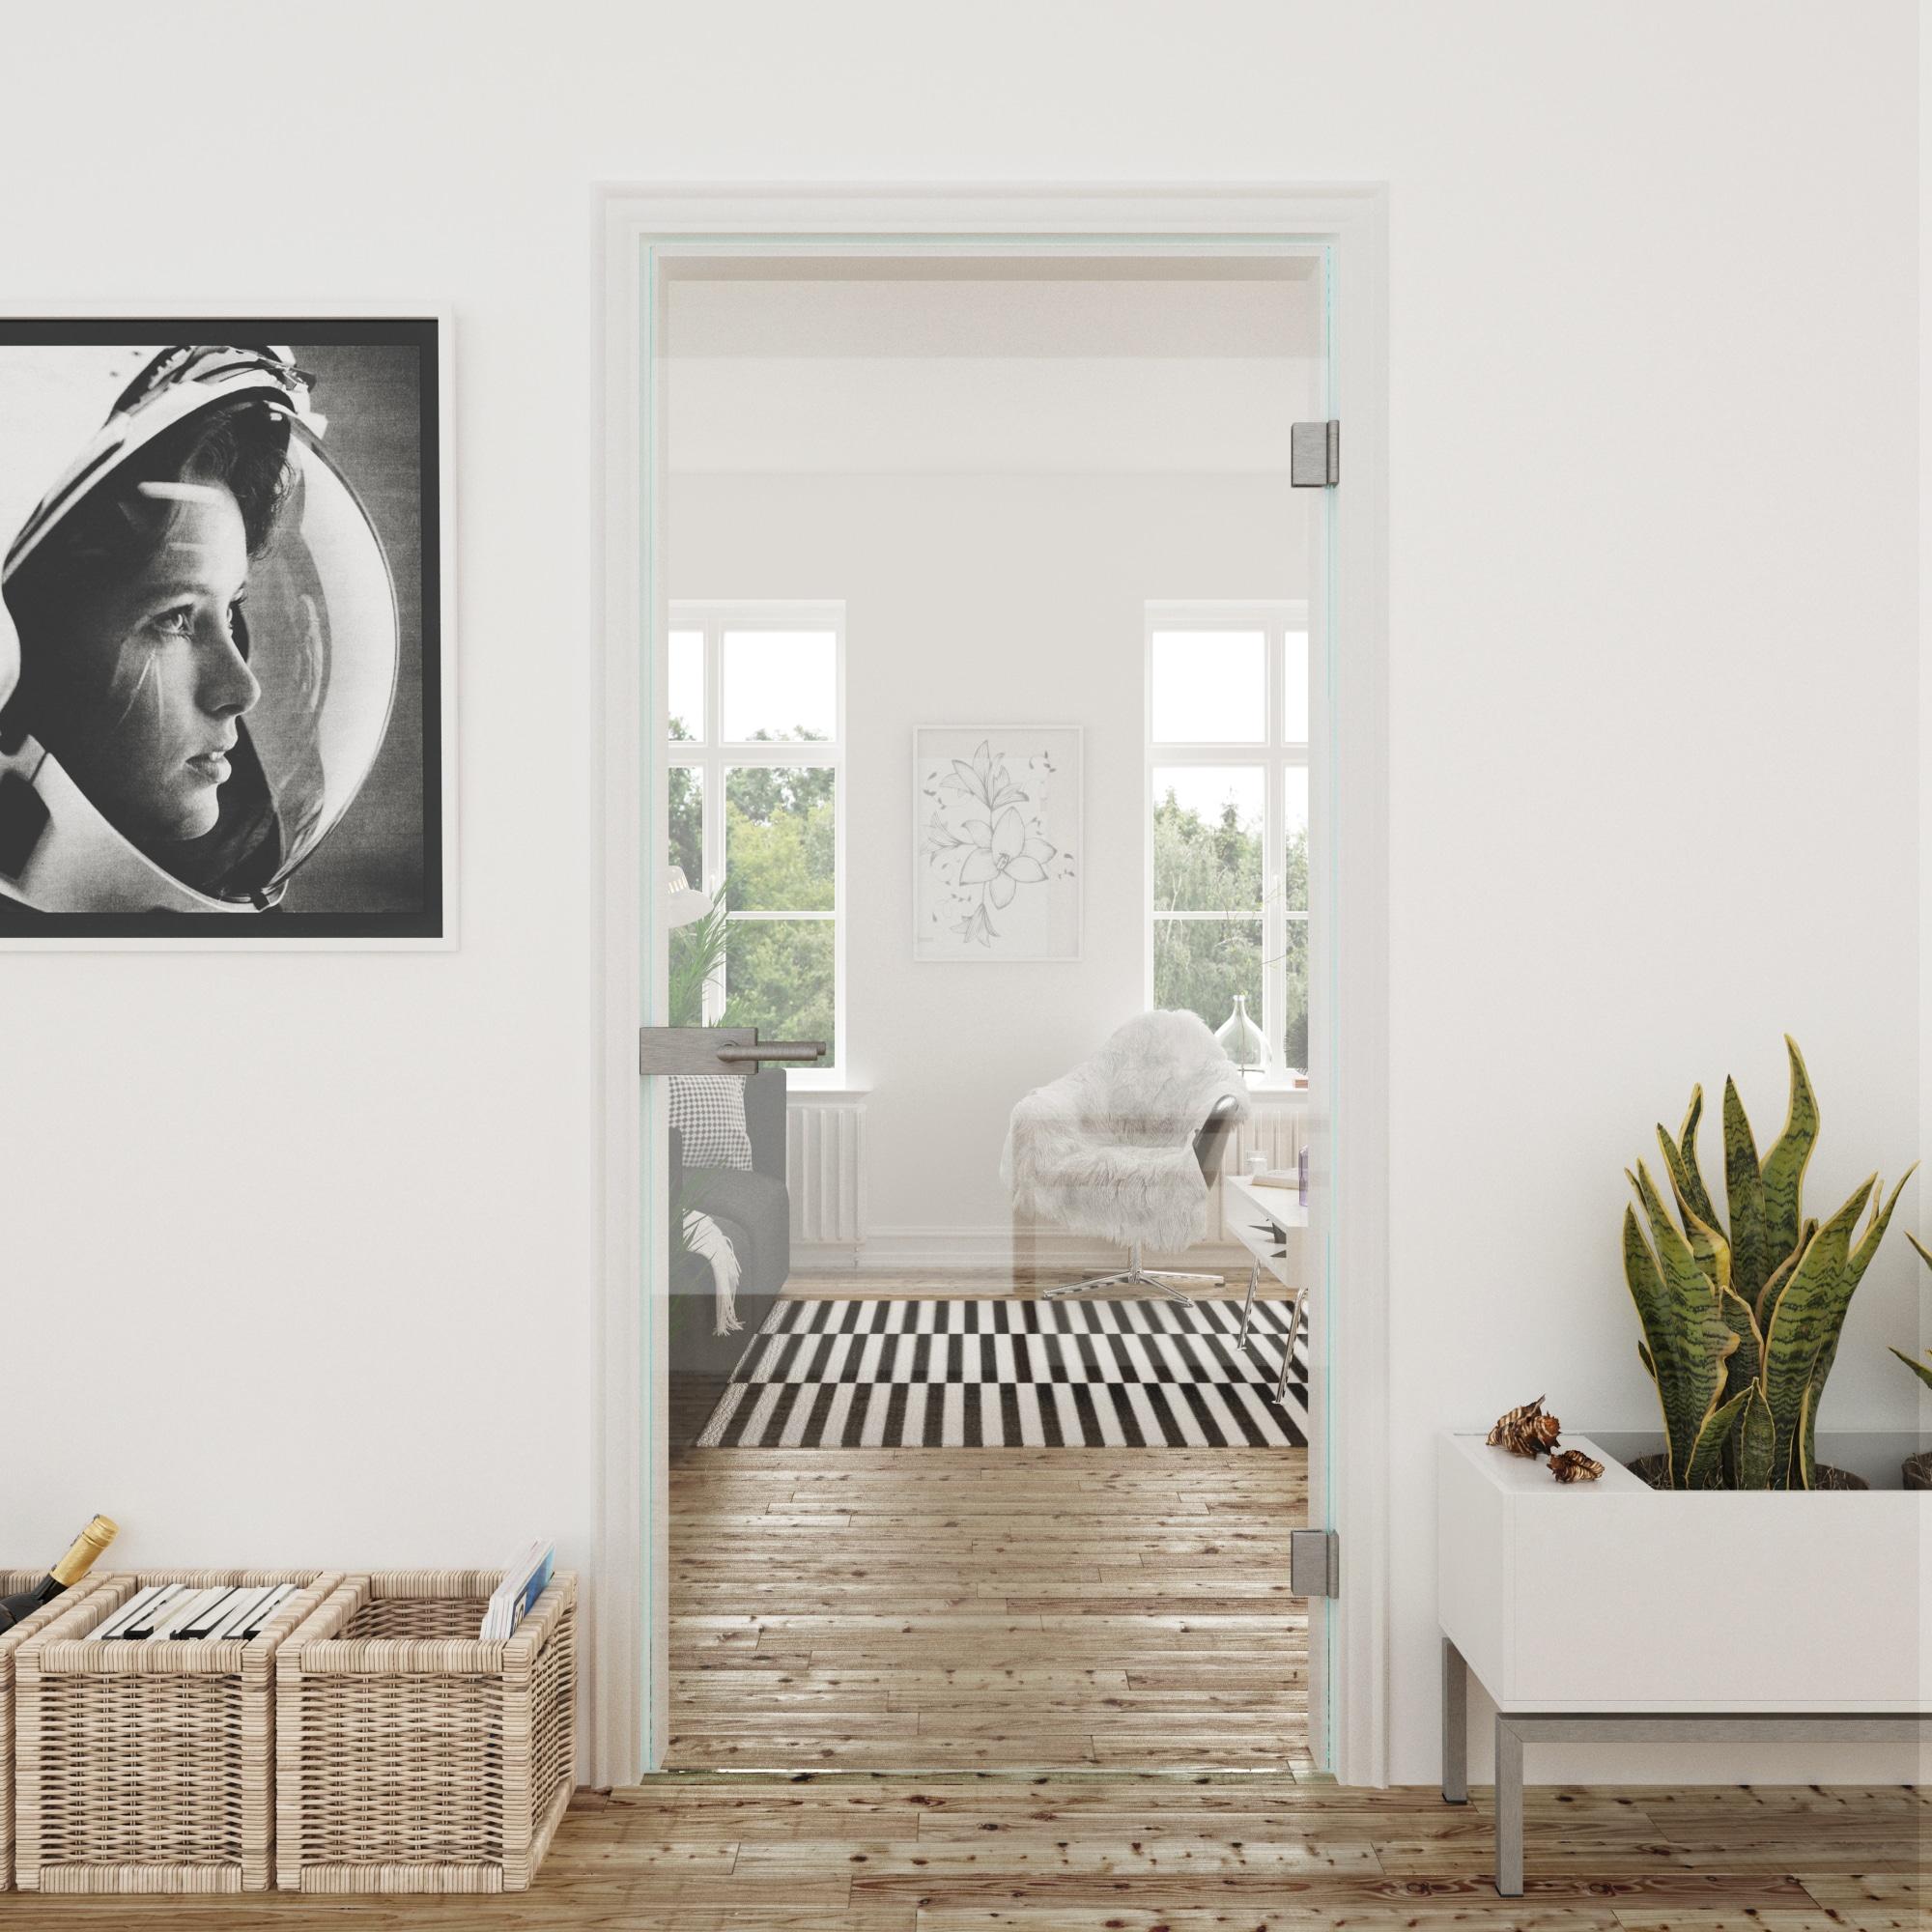 Glazen binnendeur van glas met scharnieren en deurklink in woonkamer